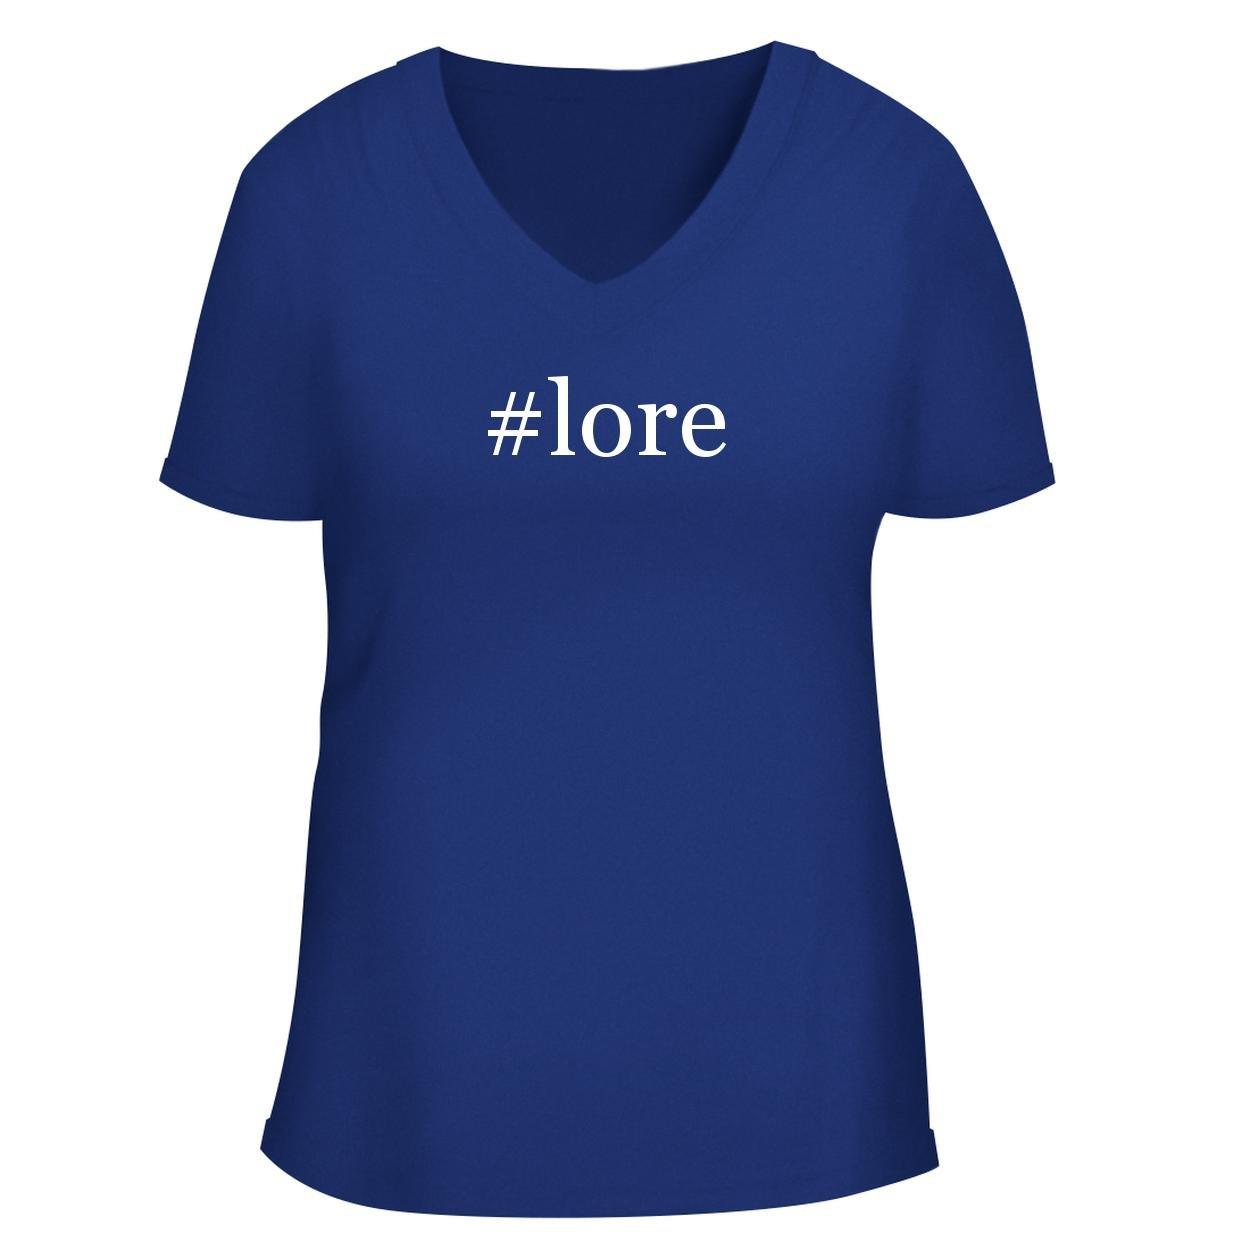 Lore Cute Graphic Tee 7615 Shirts